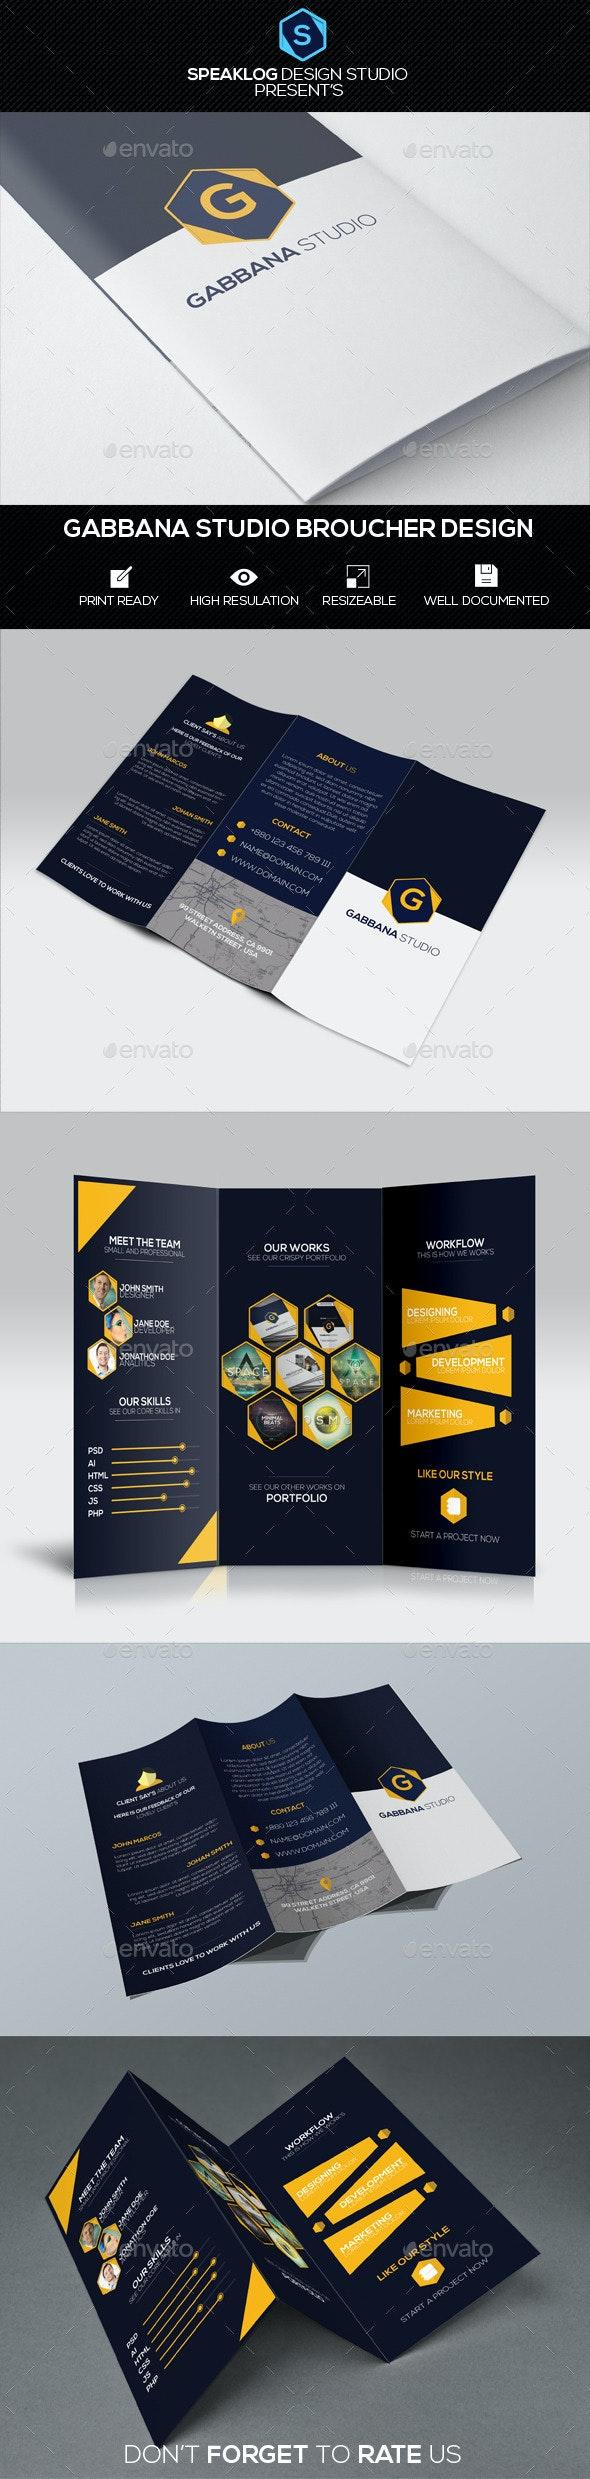 Gabbana Studio Try-Fold Brochur Design - Corporate Brochures